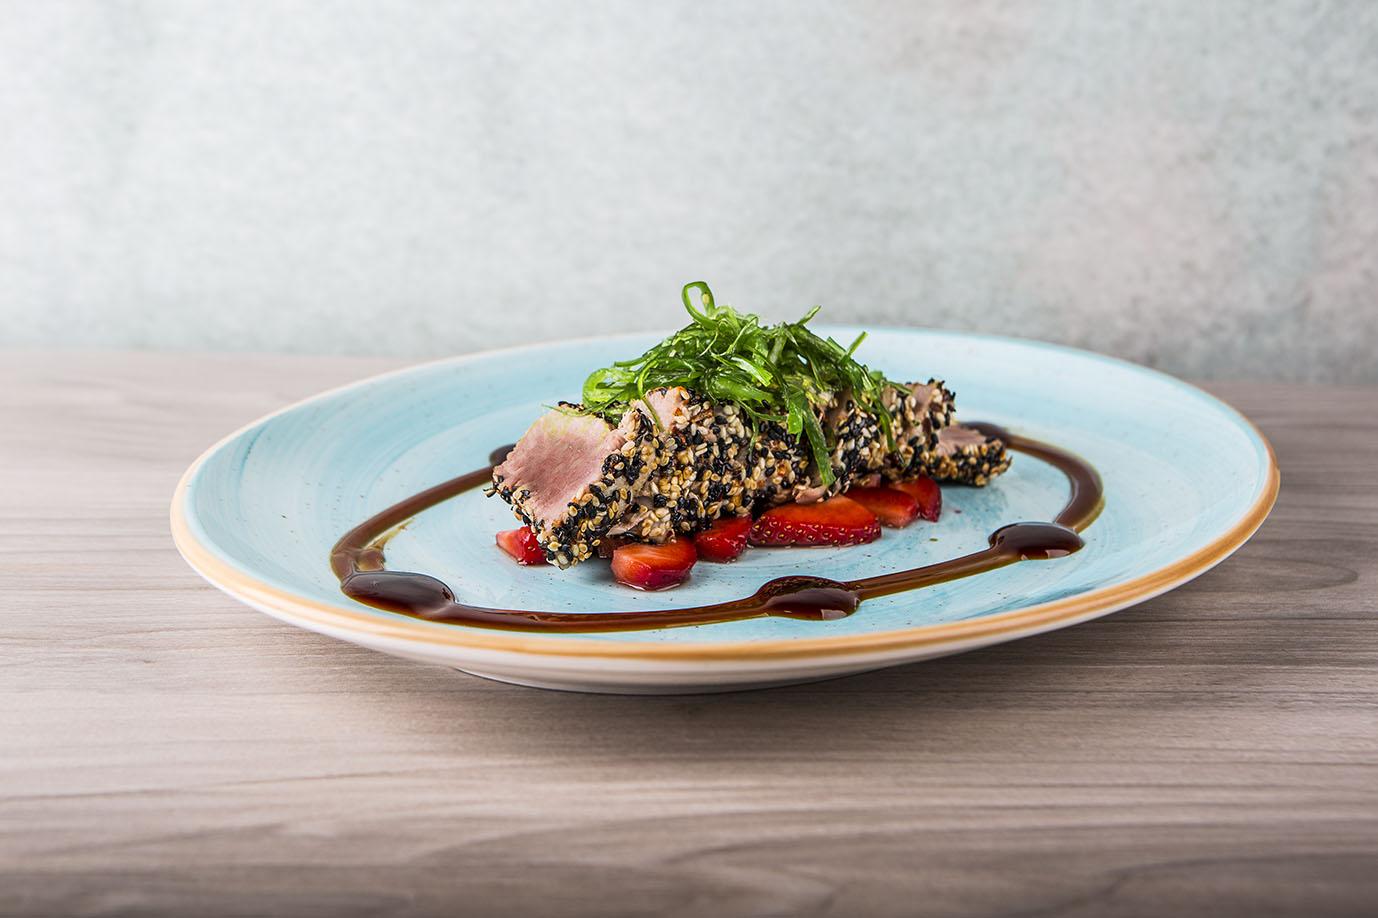 Tataki de atún sobre carpaccio de fresa - NoMad Food&Bar - Vincci Soho